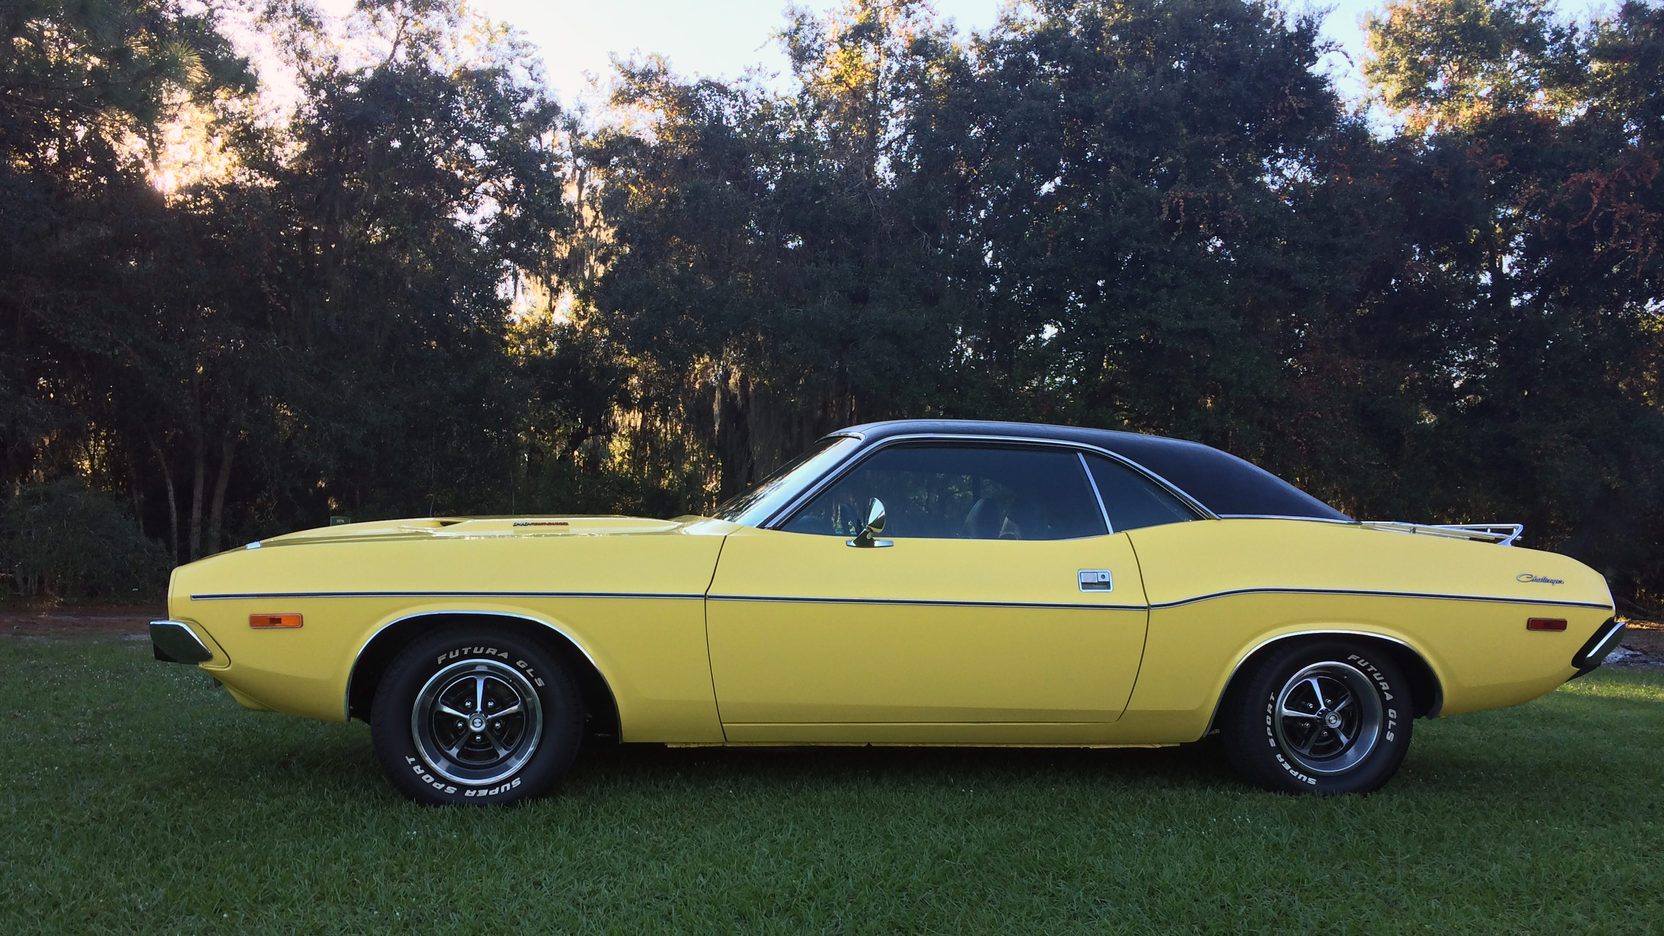 1973 Dodge Challenger K125 Kissimmee 2015